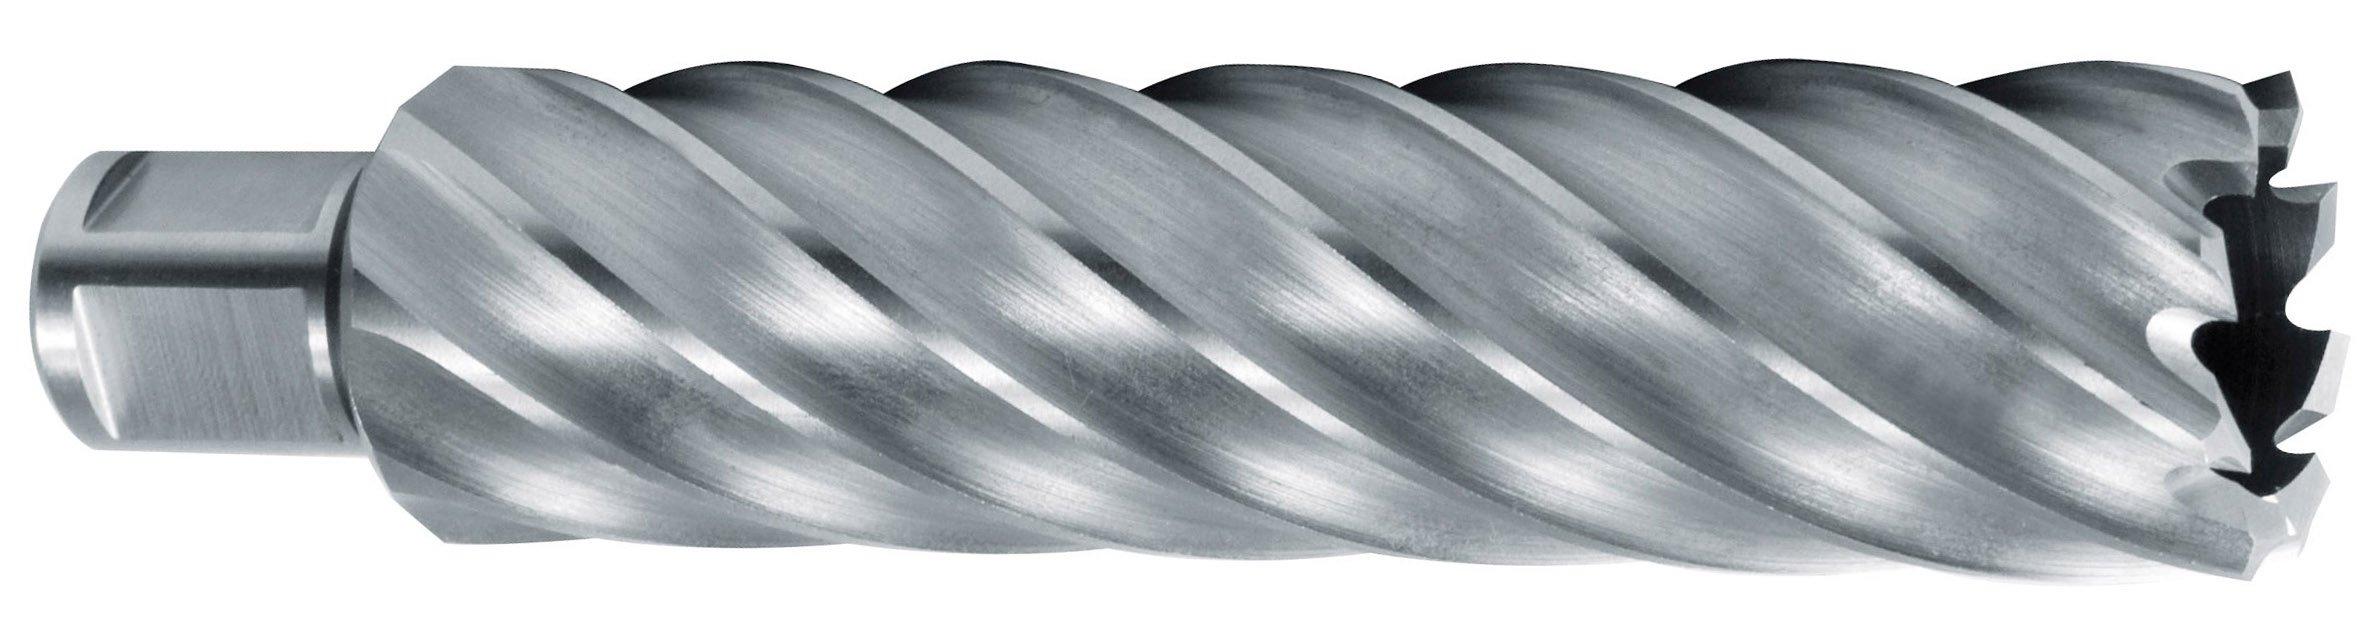 'RUKO 1082022-HSS Core Bit with Weldon Shank (3/4), Full Ground CBN, Cutting Depth 110mm (22x 19mm)